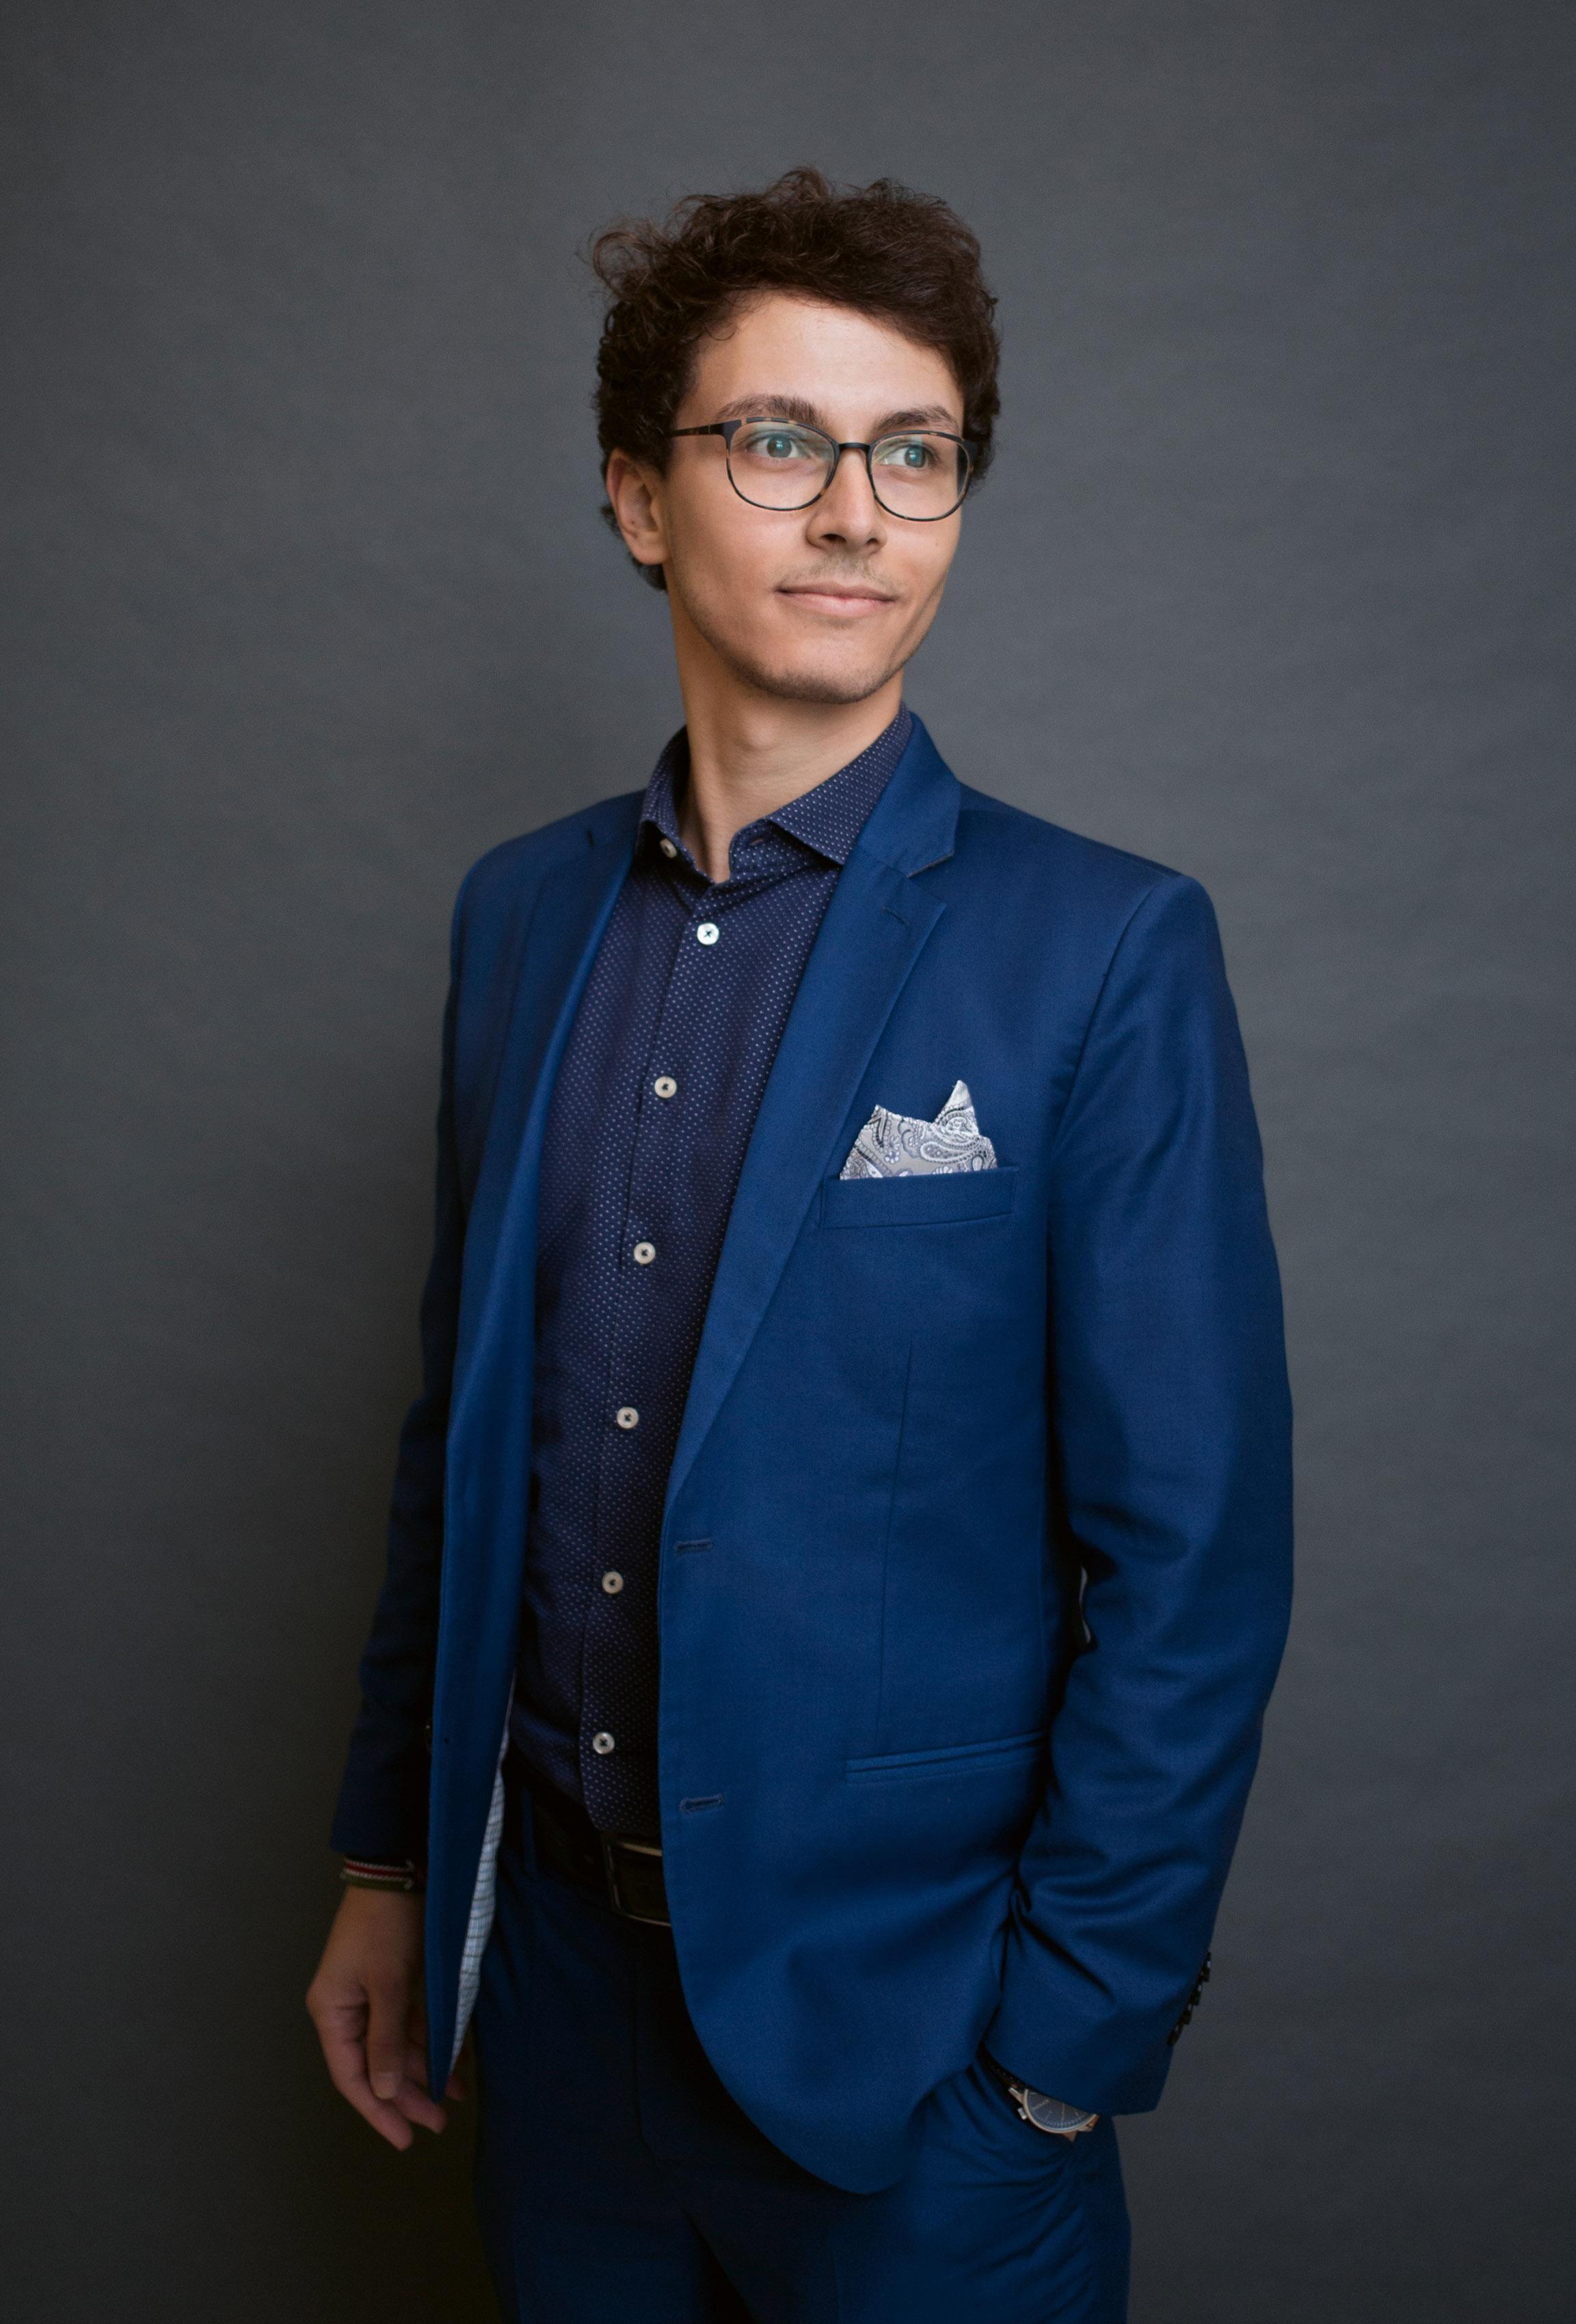 Saad Azza